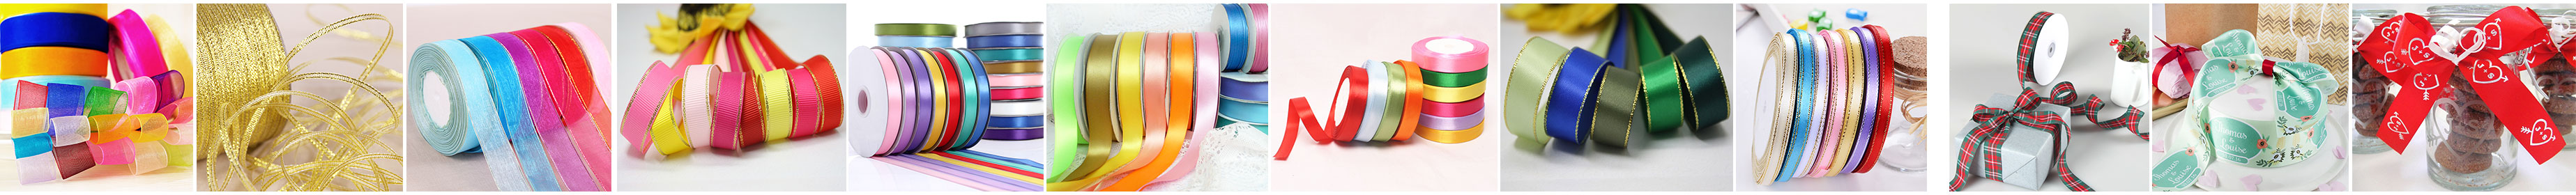 Xiamen Lude Ribbons & Bows Co., Ltd. - Ribbon